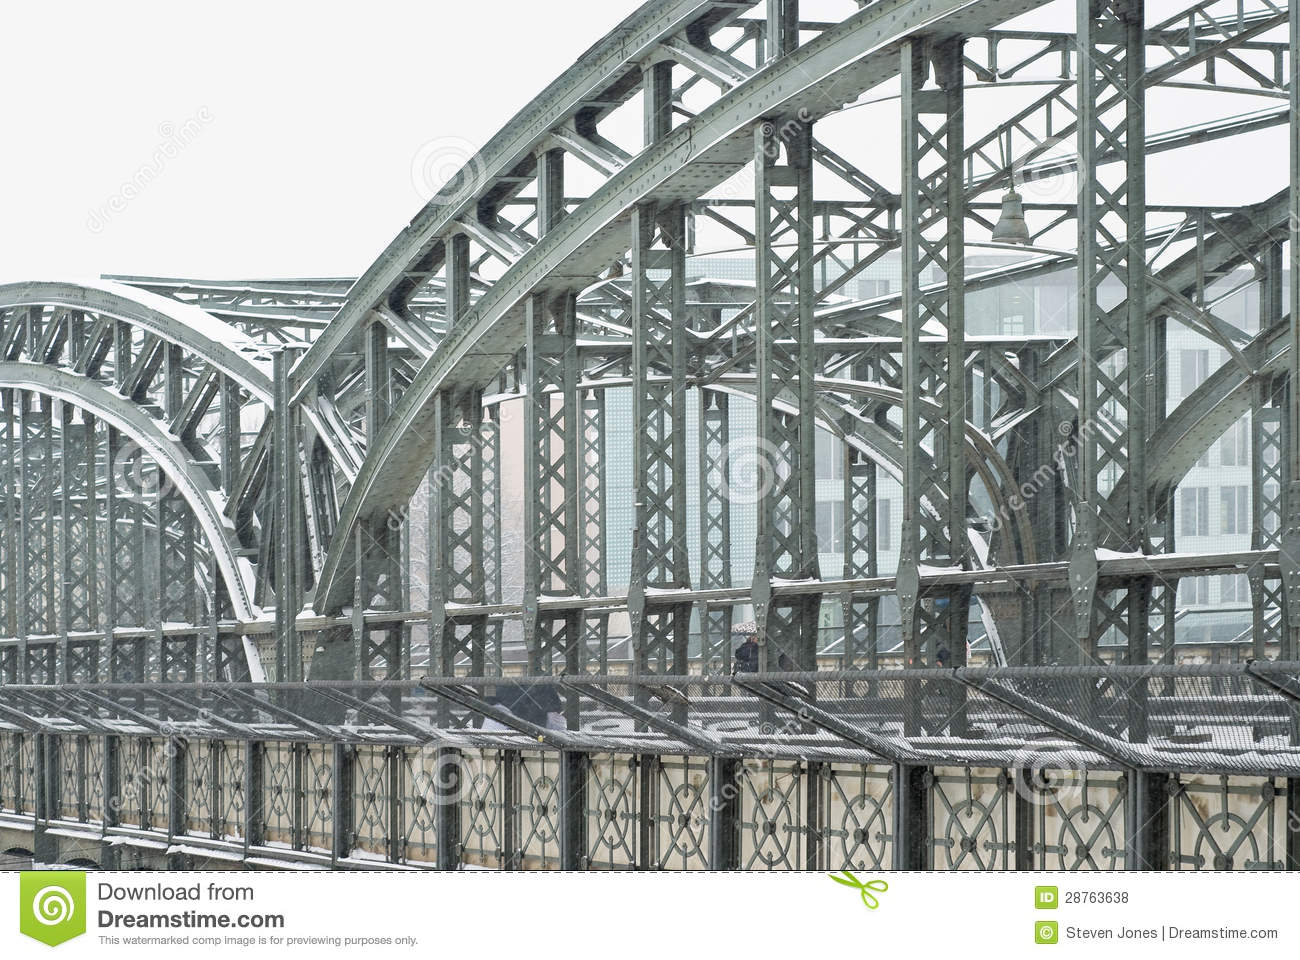 Steel Girders On A Metal Truss Bridge Stock Images.